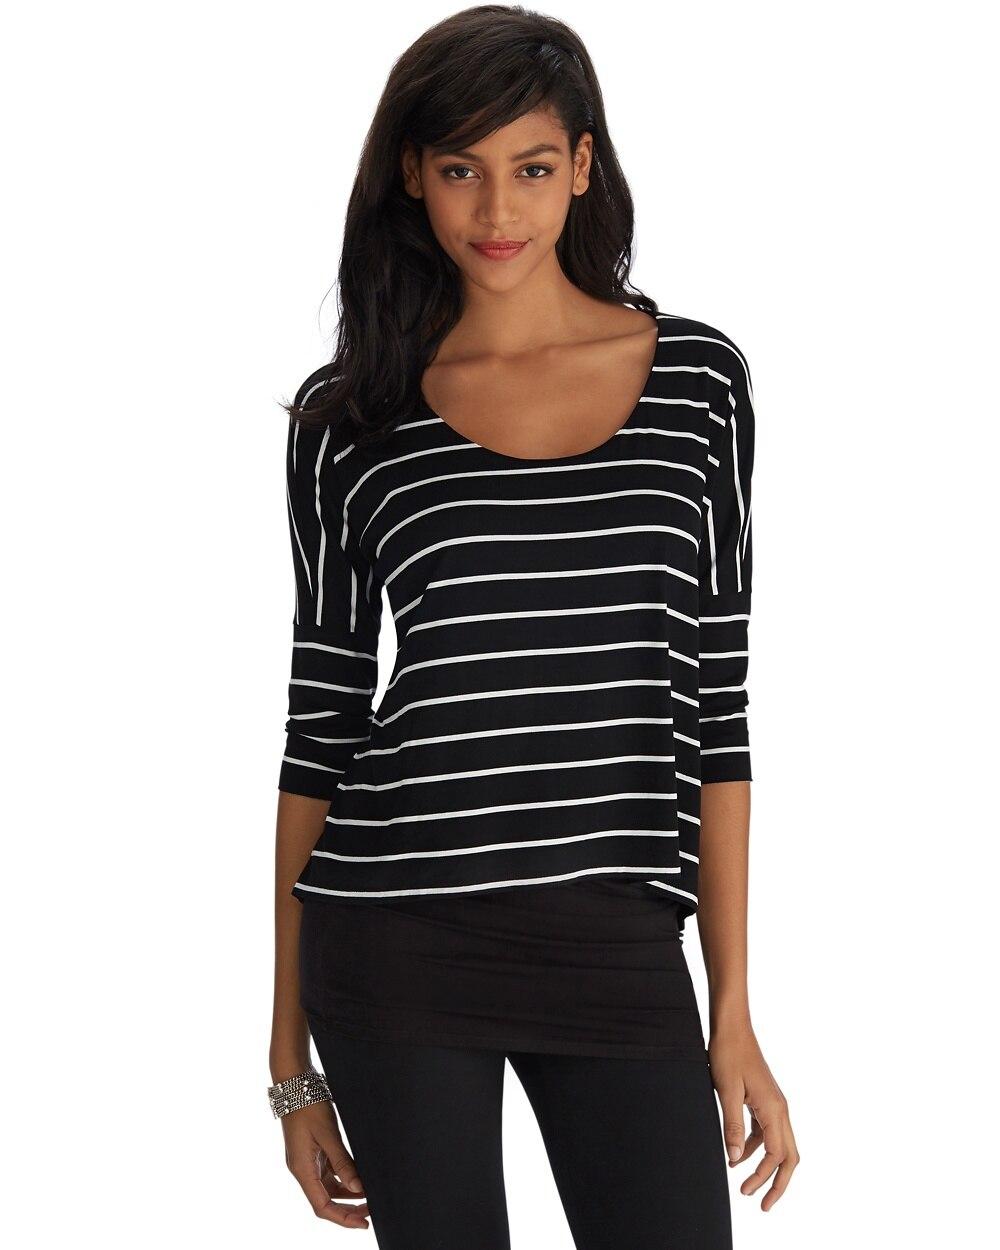 37e5f4d0757 3/4 Sleeve Stripe Double Tunic - White House Black Market